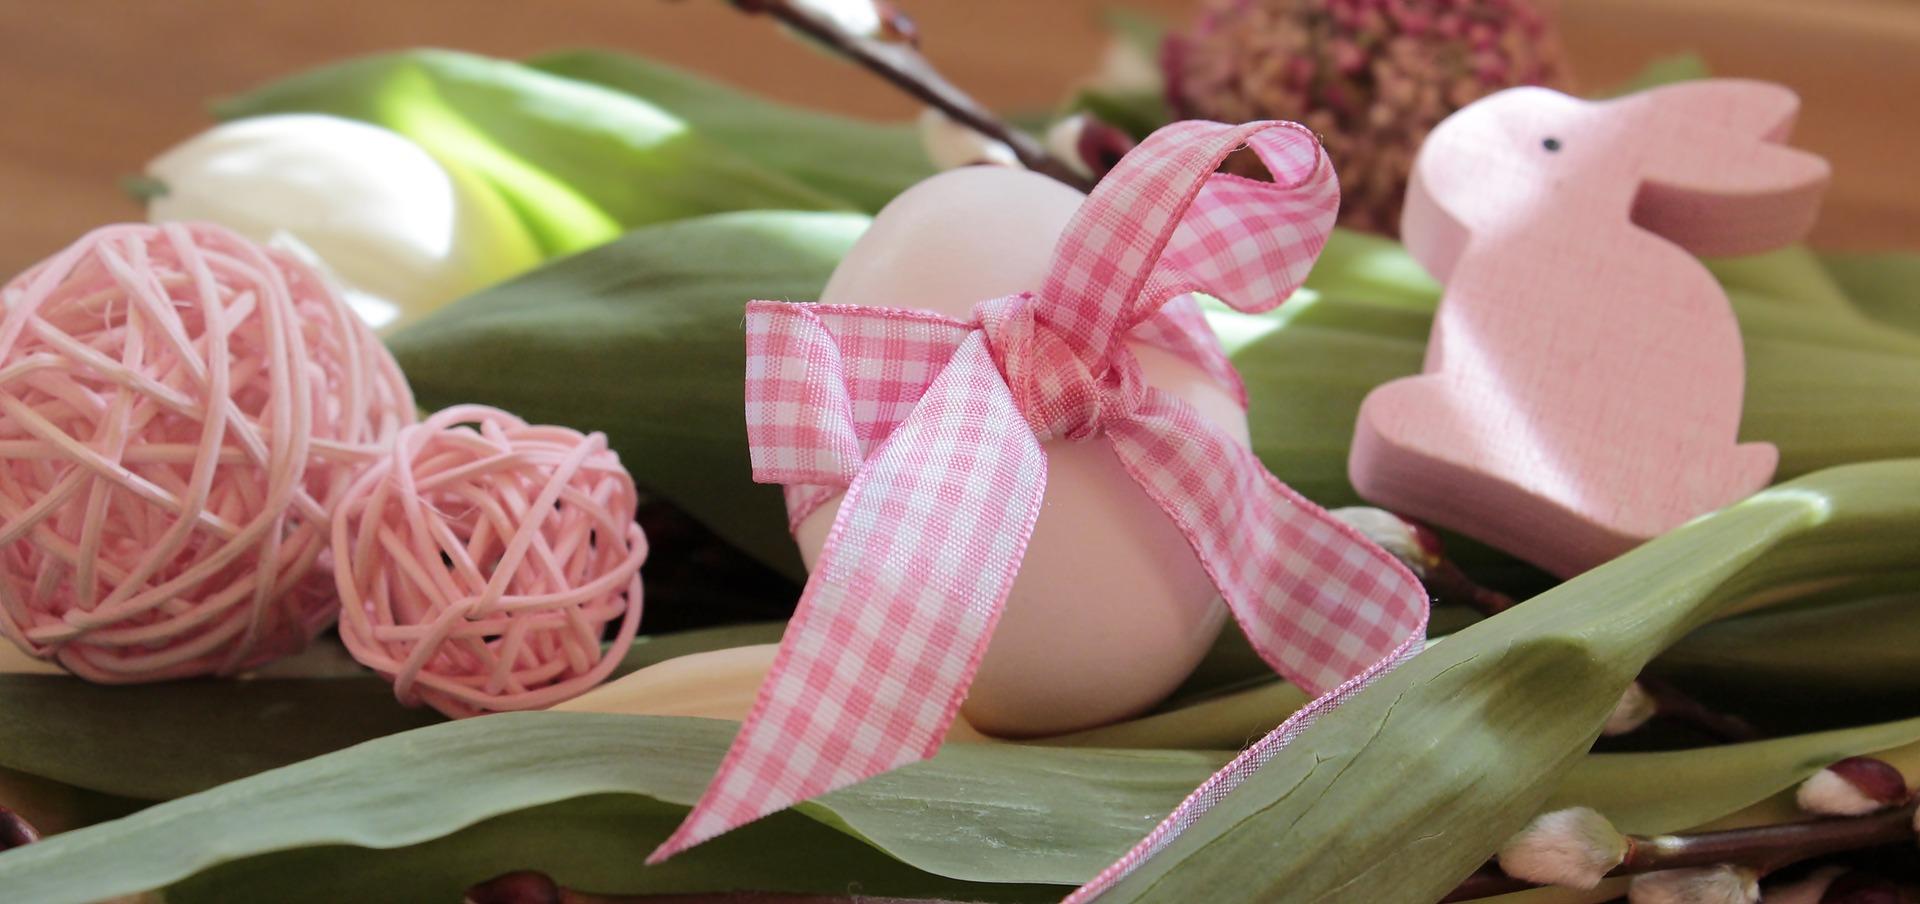 easter egg 3257179 1920 - Co wiecie o Wielkanocy?